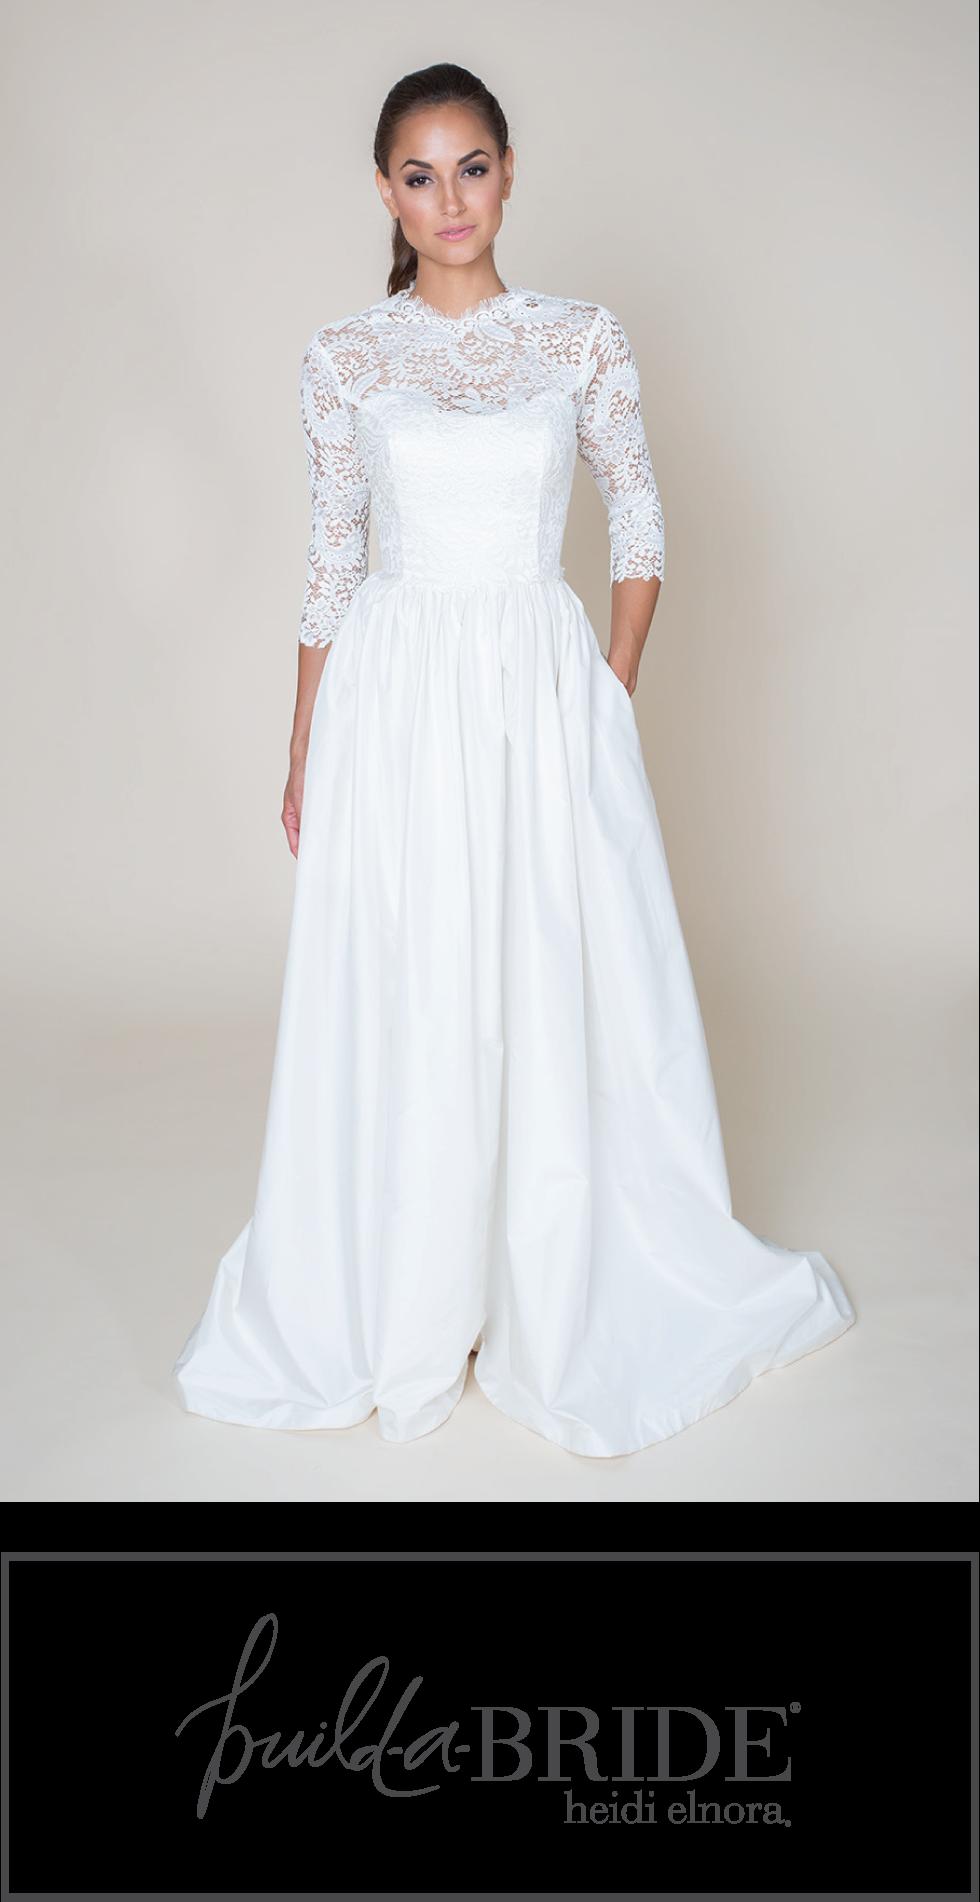 Build-A-Bride wedding dress collection by Heidi Elnora in Birmingham ...